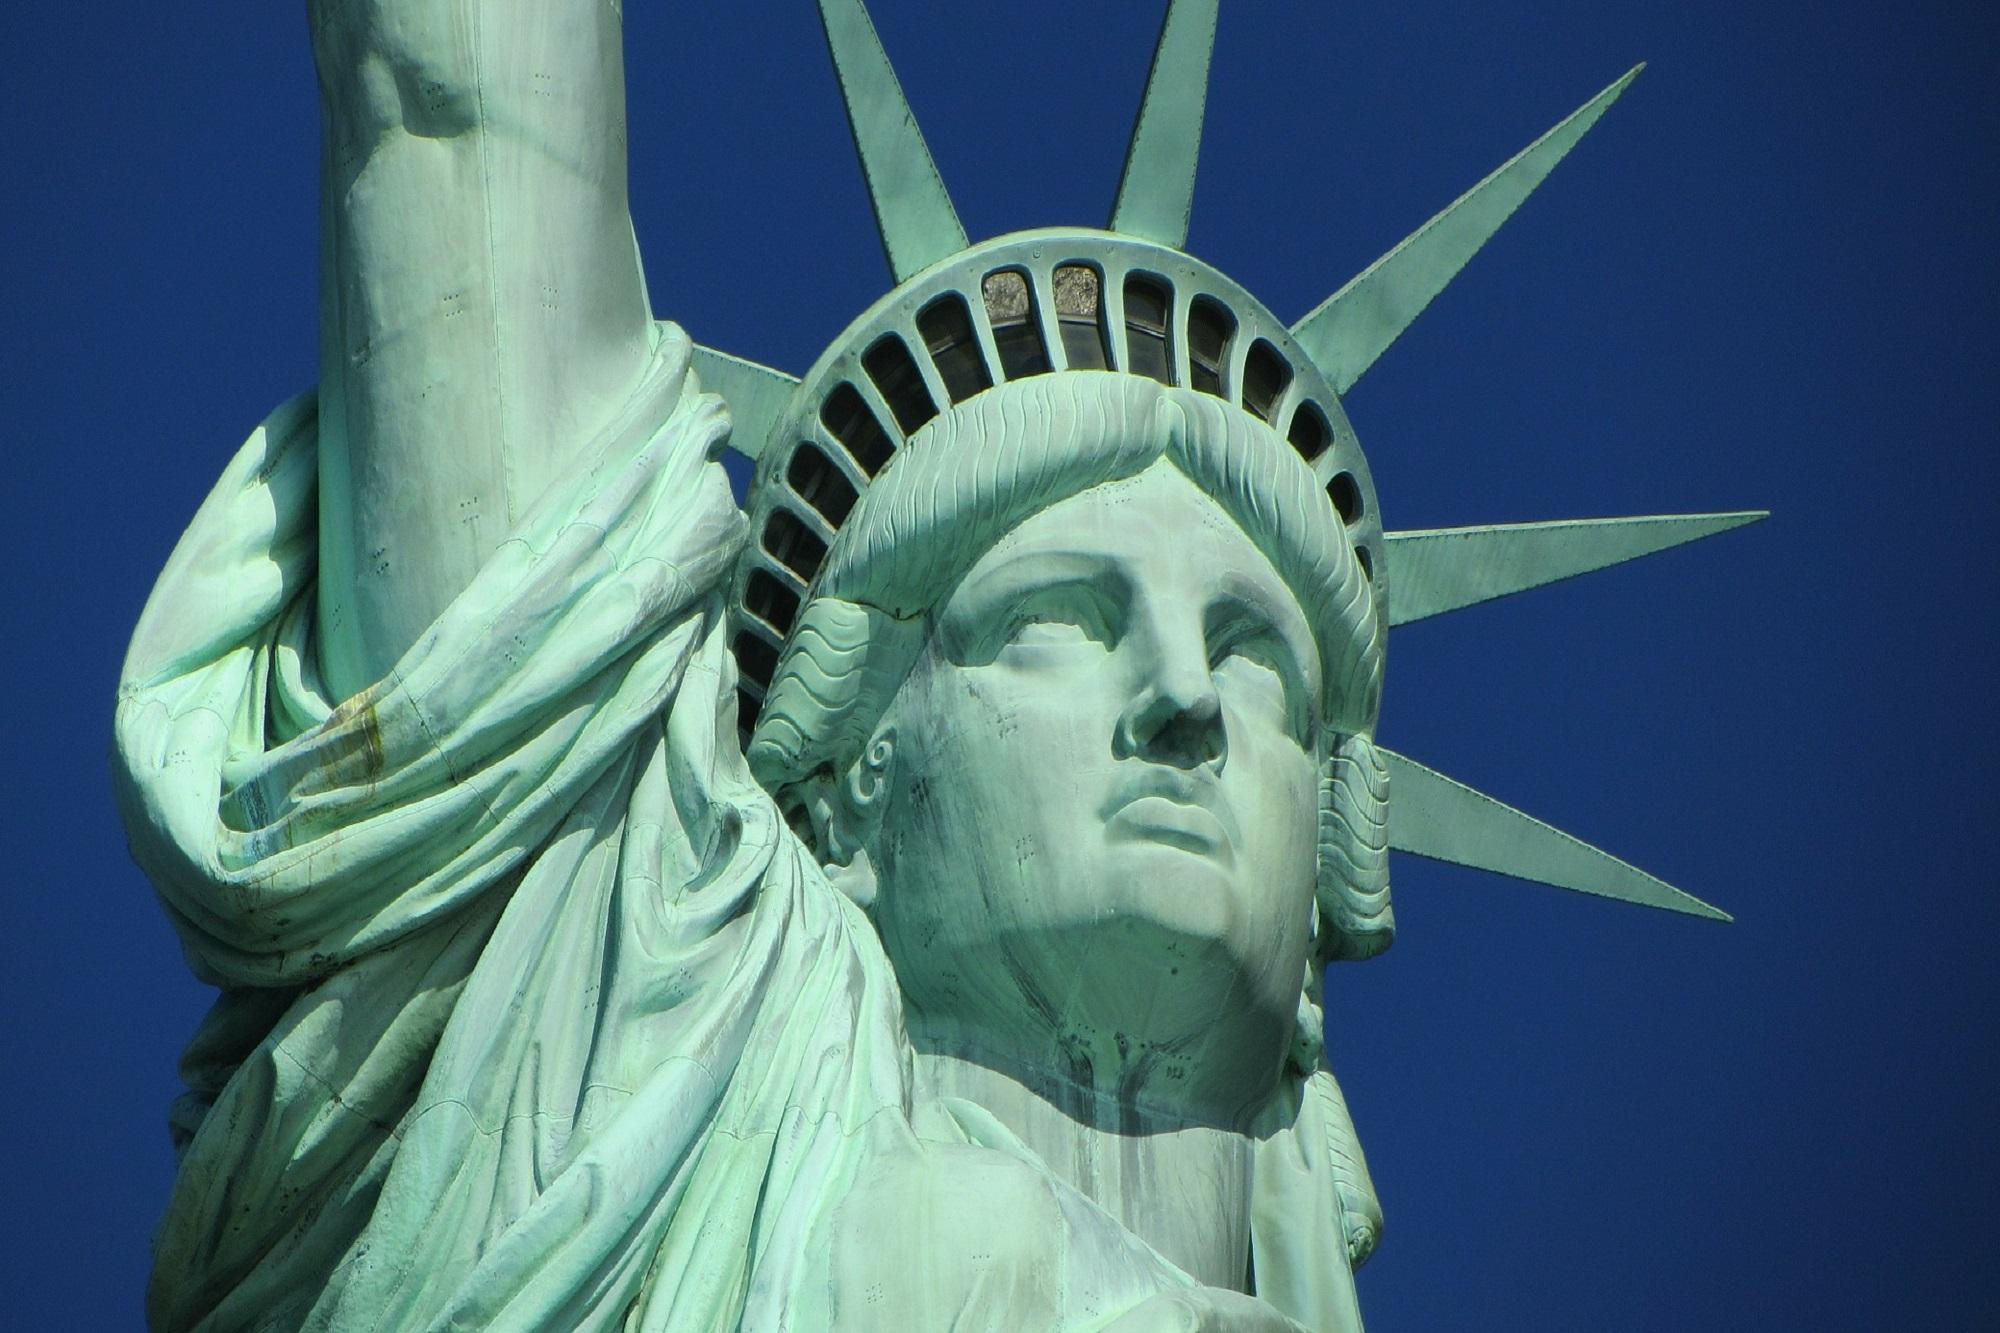 statue-of-liberty-267948_1920